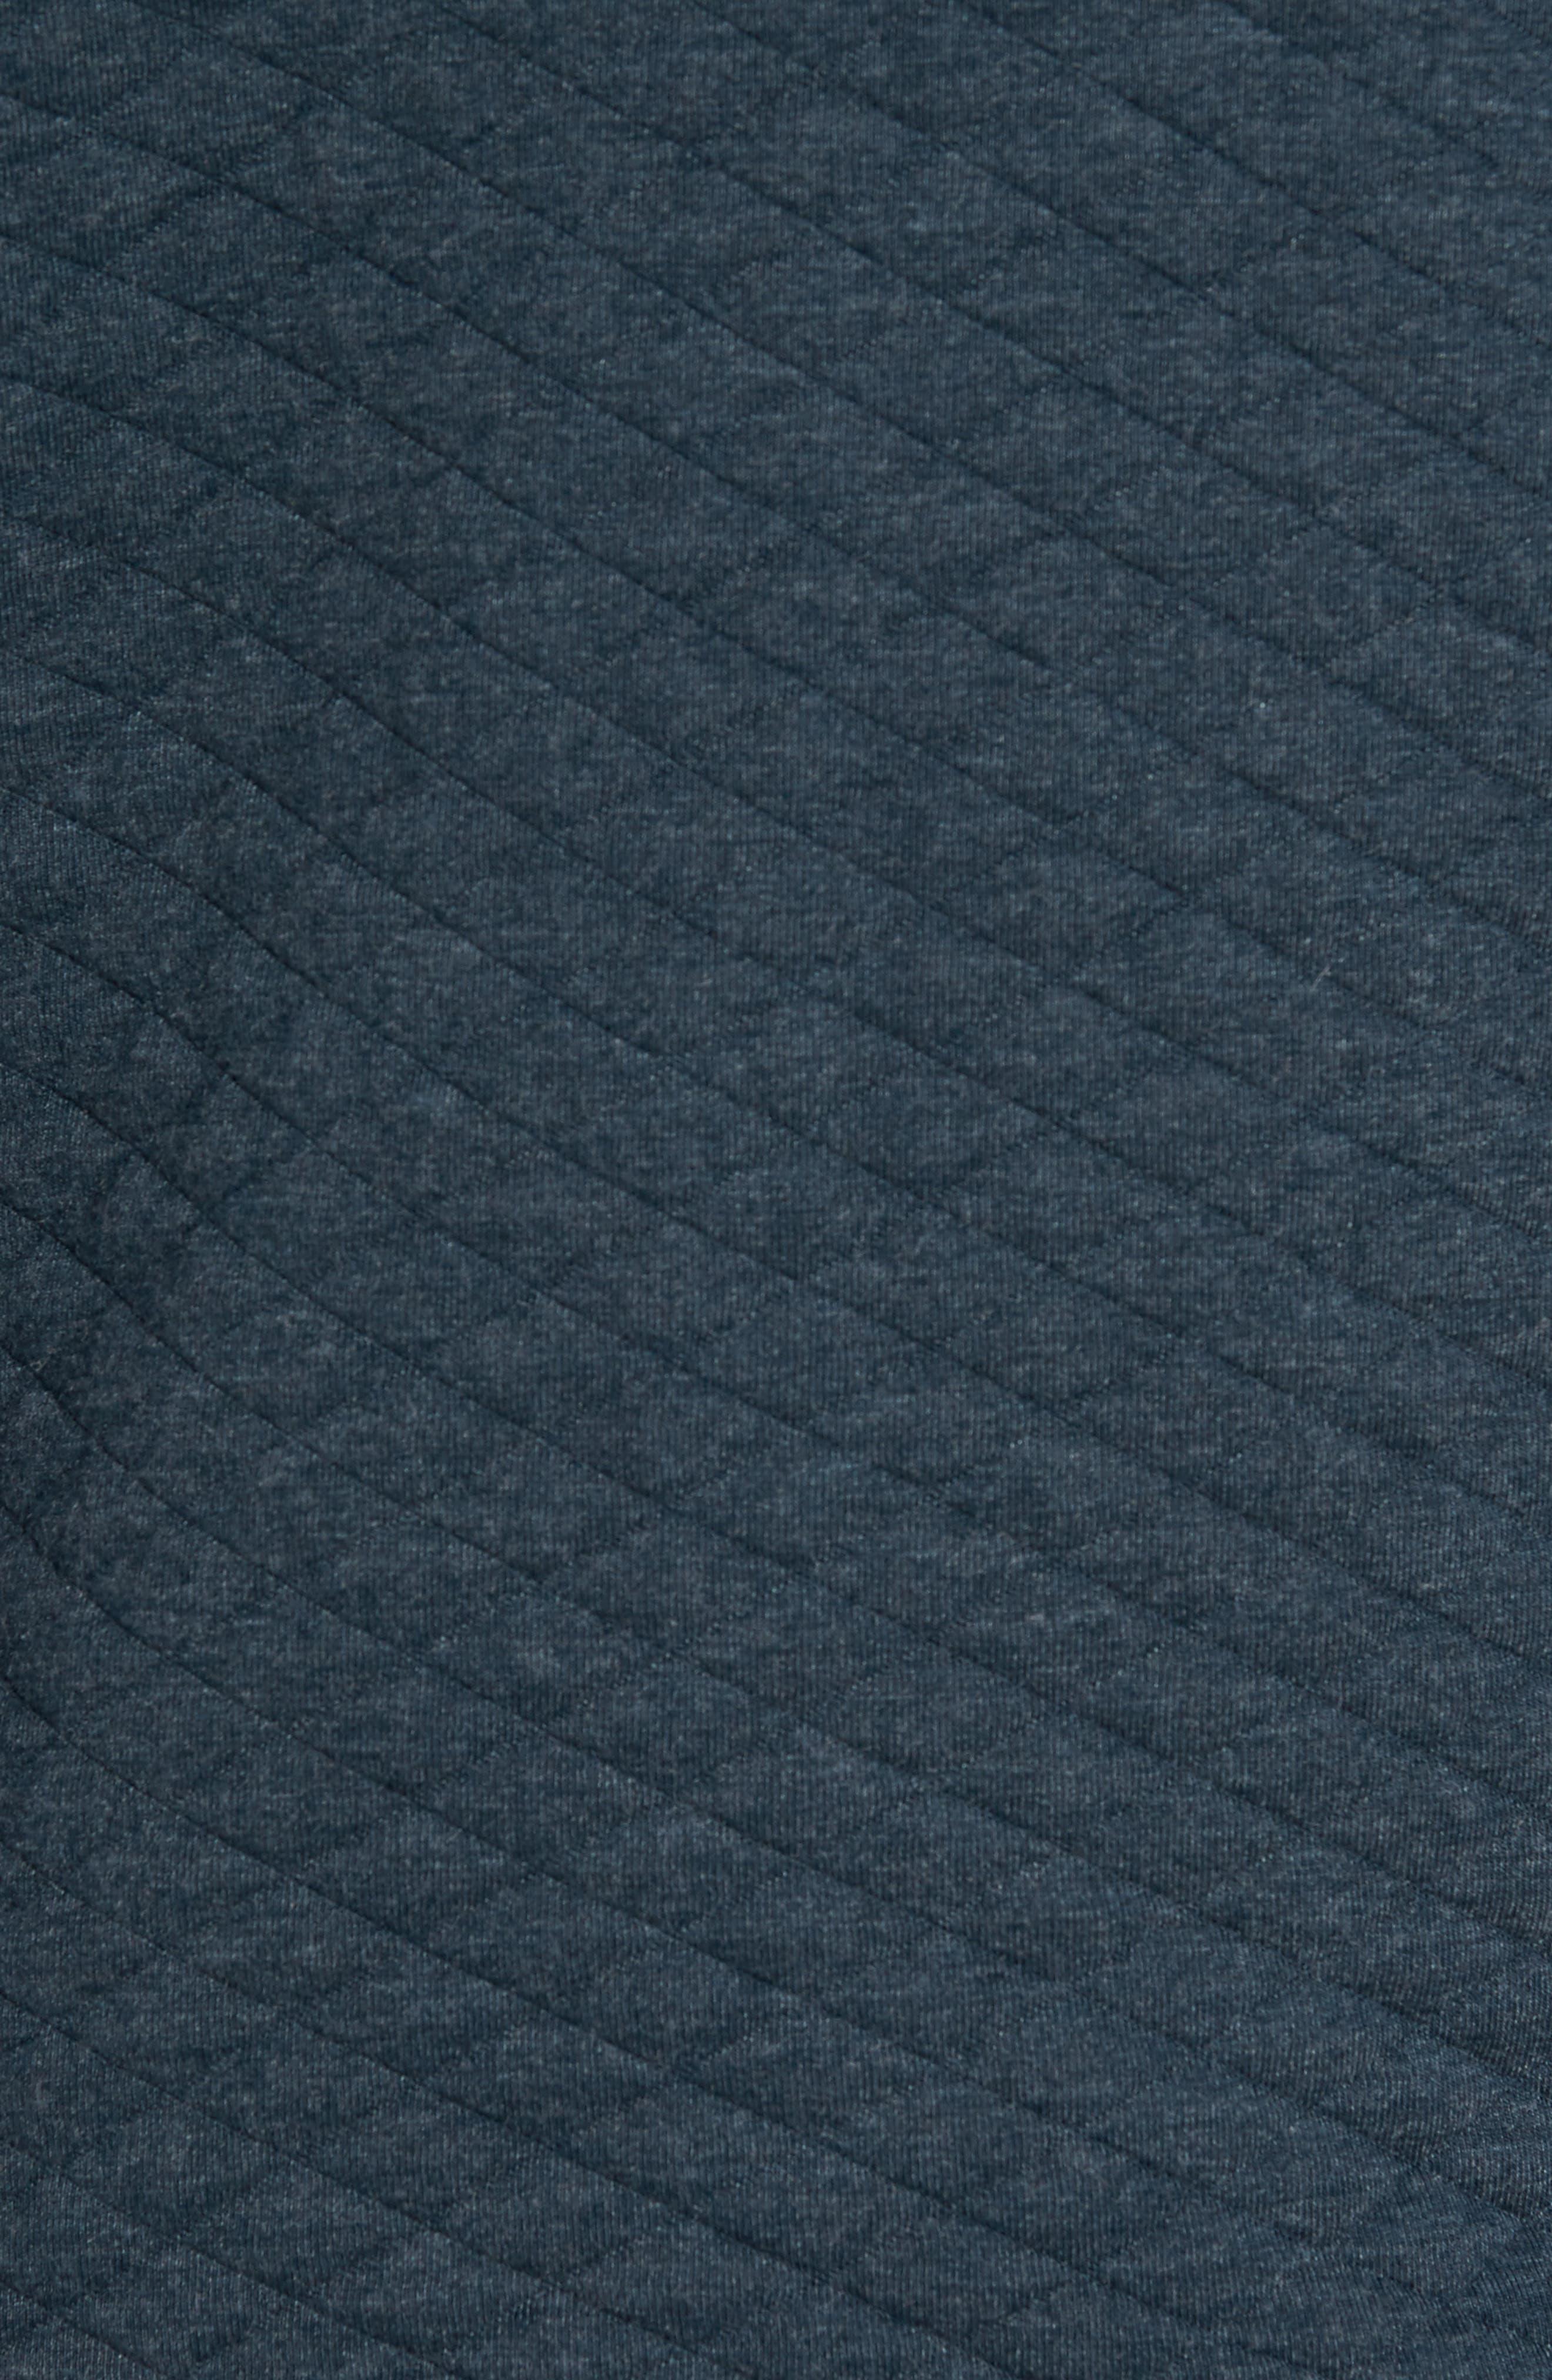 BILLY REID,                             Shawl Collar Pullover,                             Alternate thumbnail 5, color,                             402